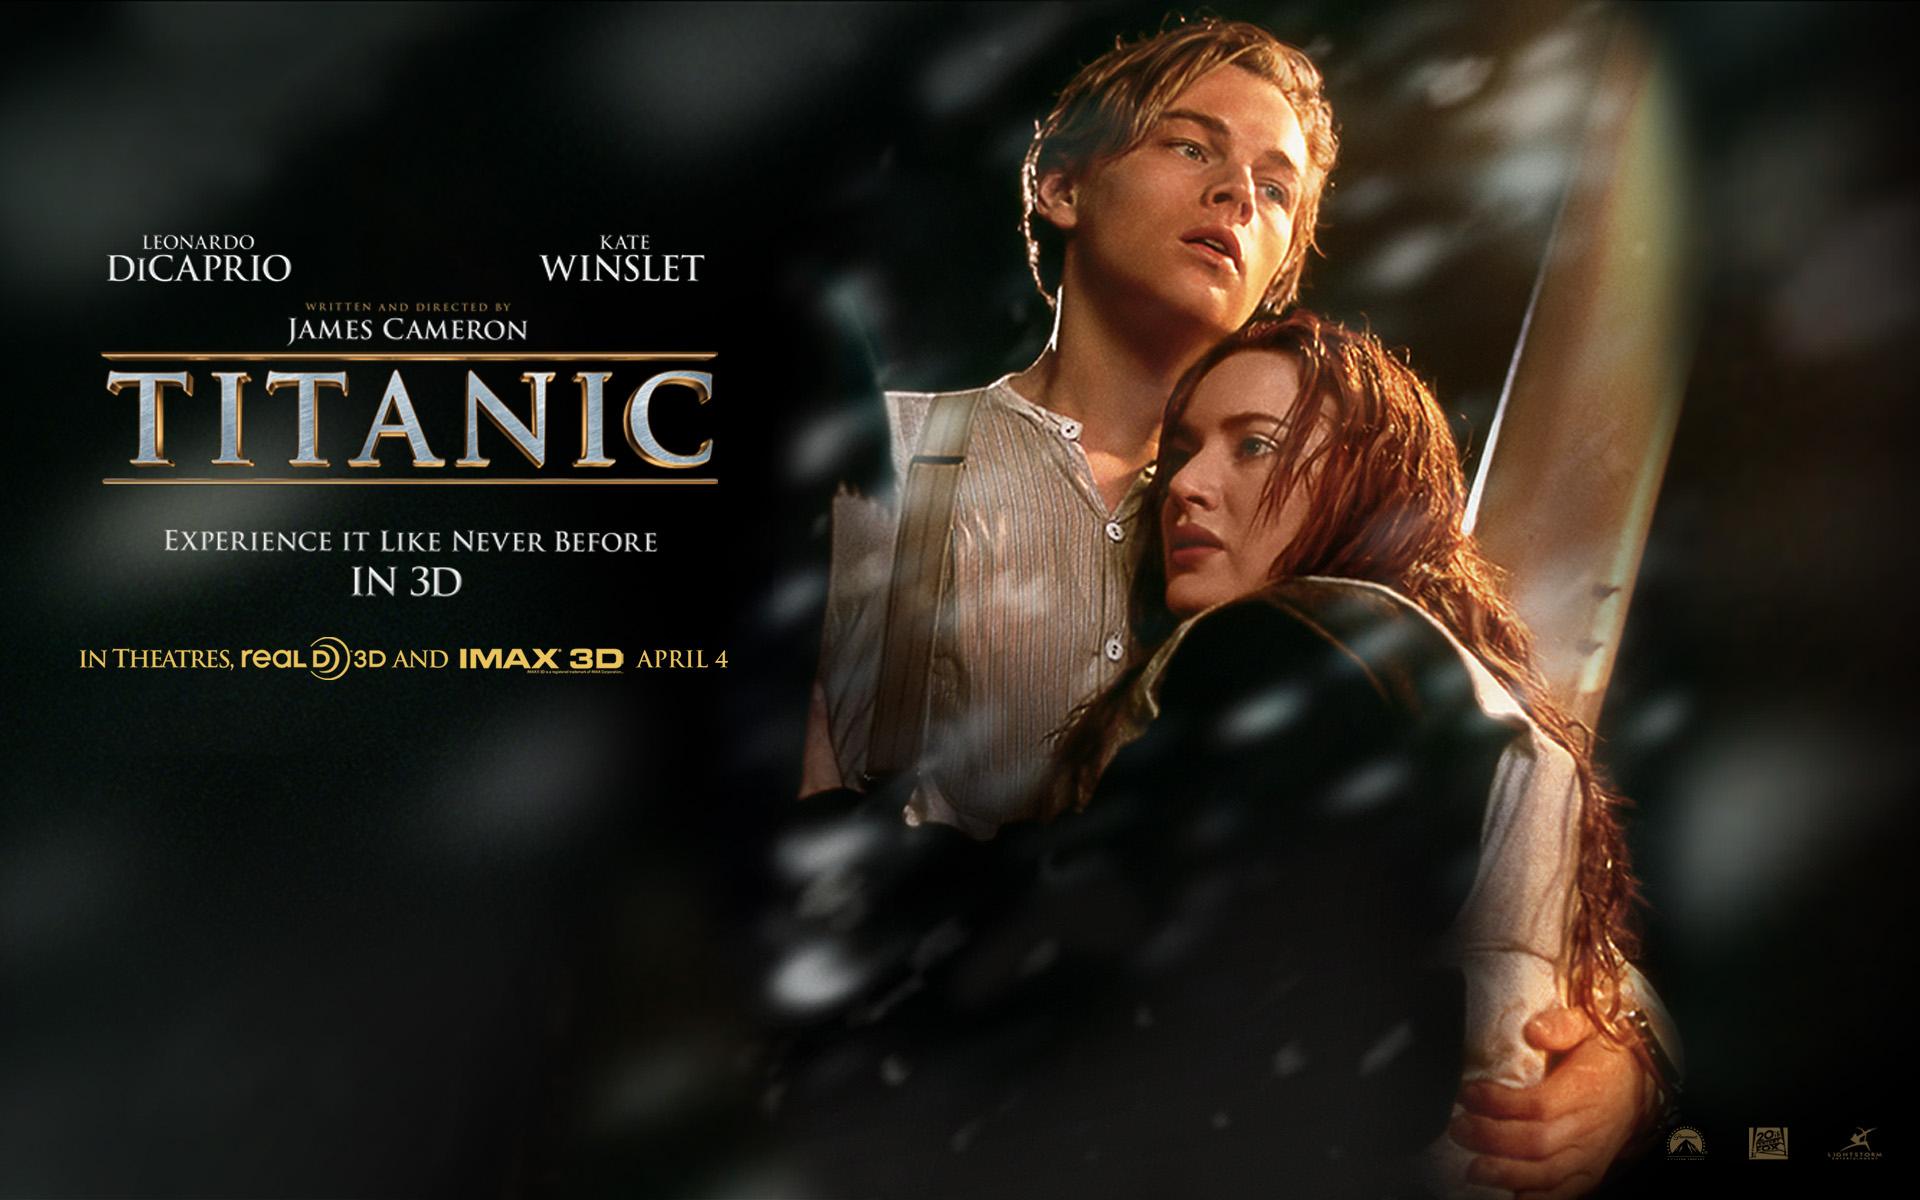 Titanic Wallpaper Movie - titanic wallpapers andTitanic Movie Wallpaper